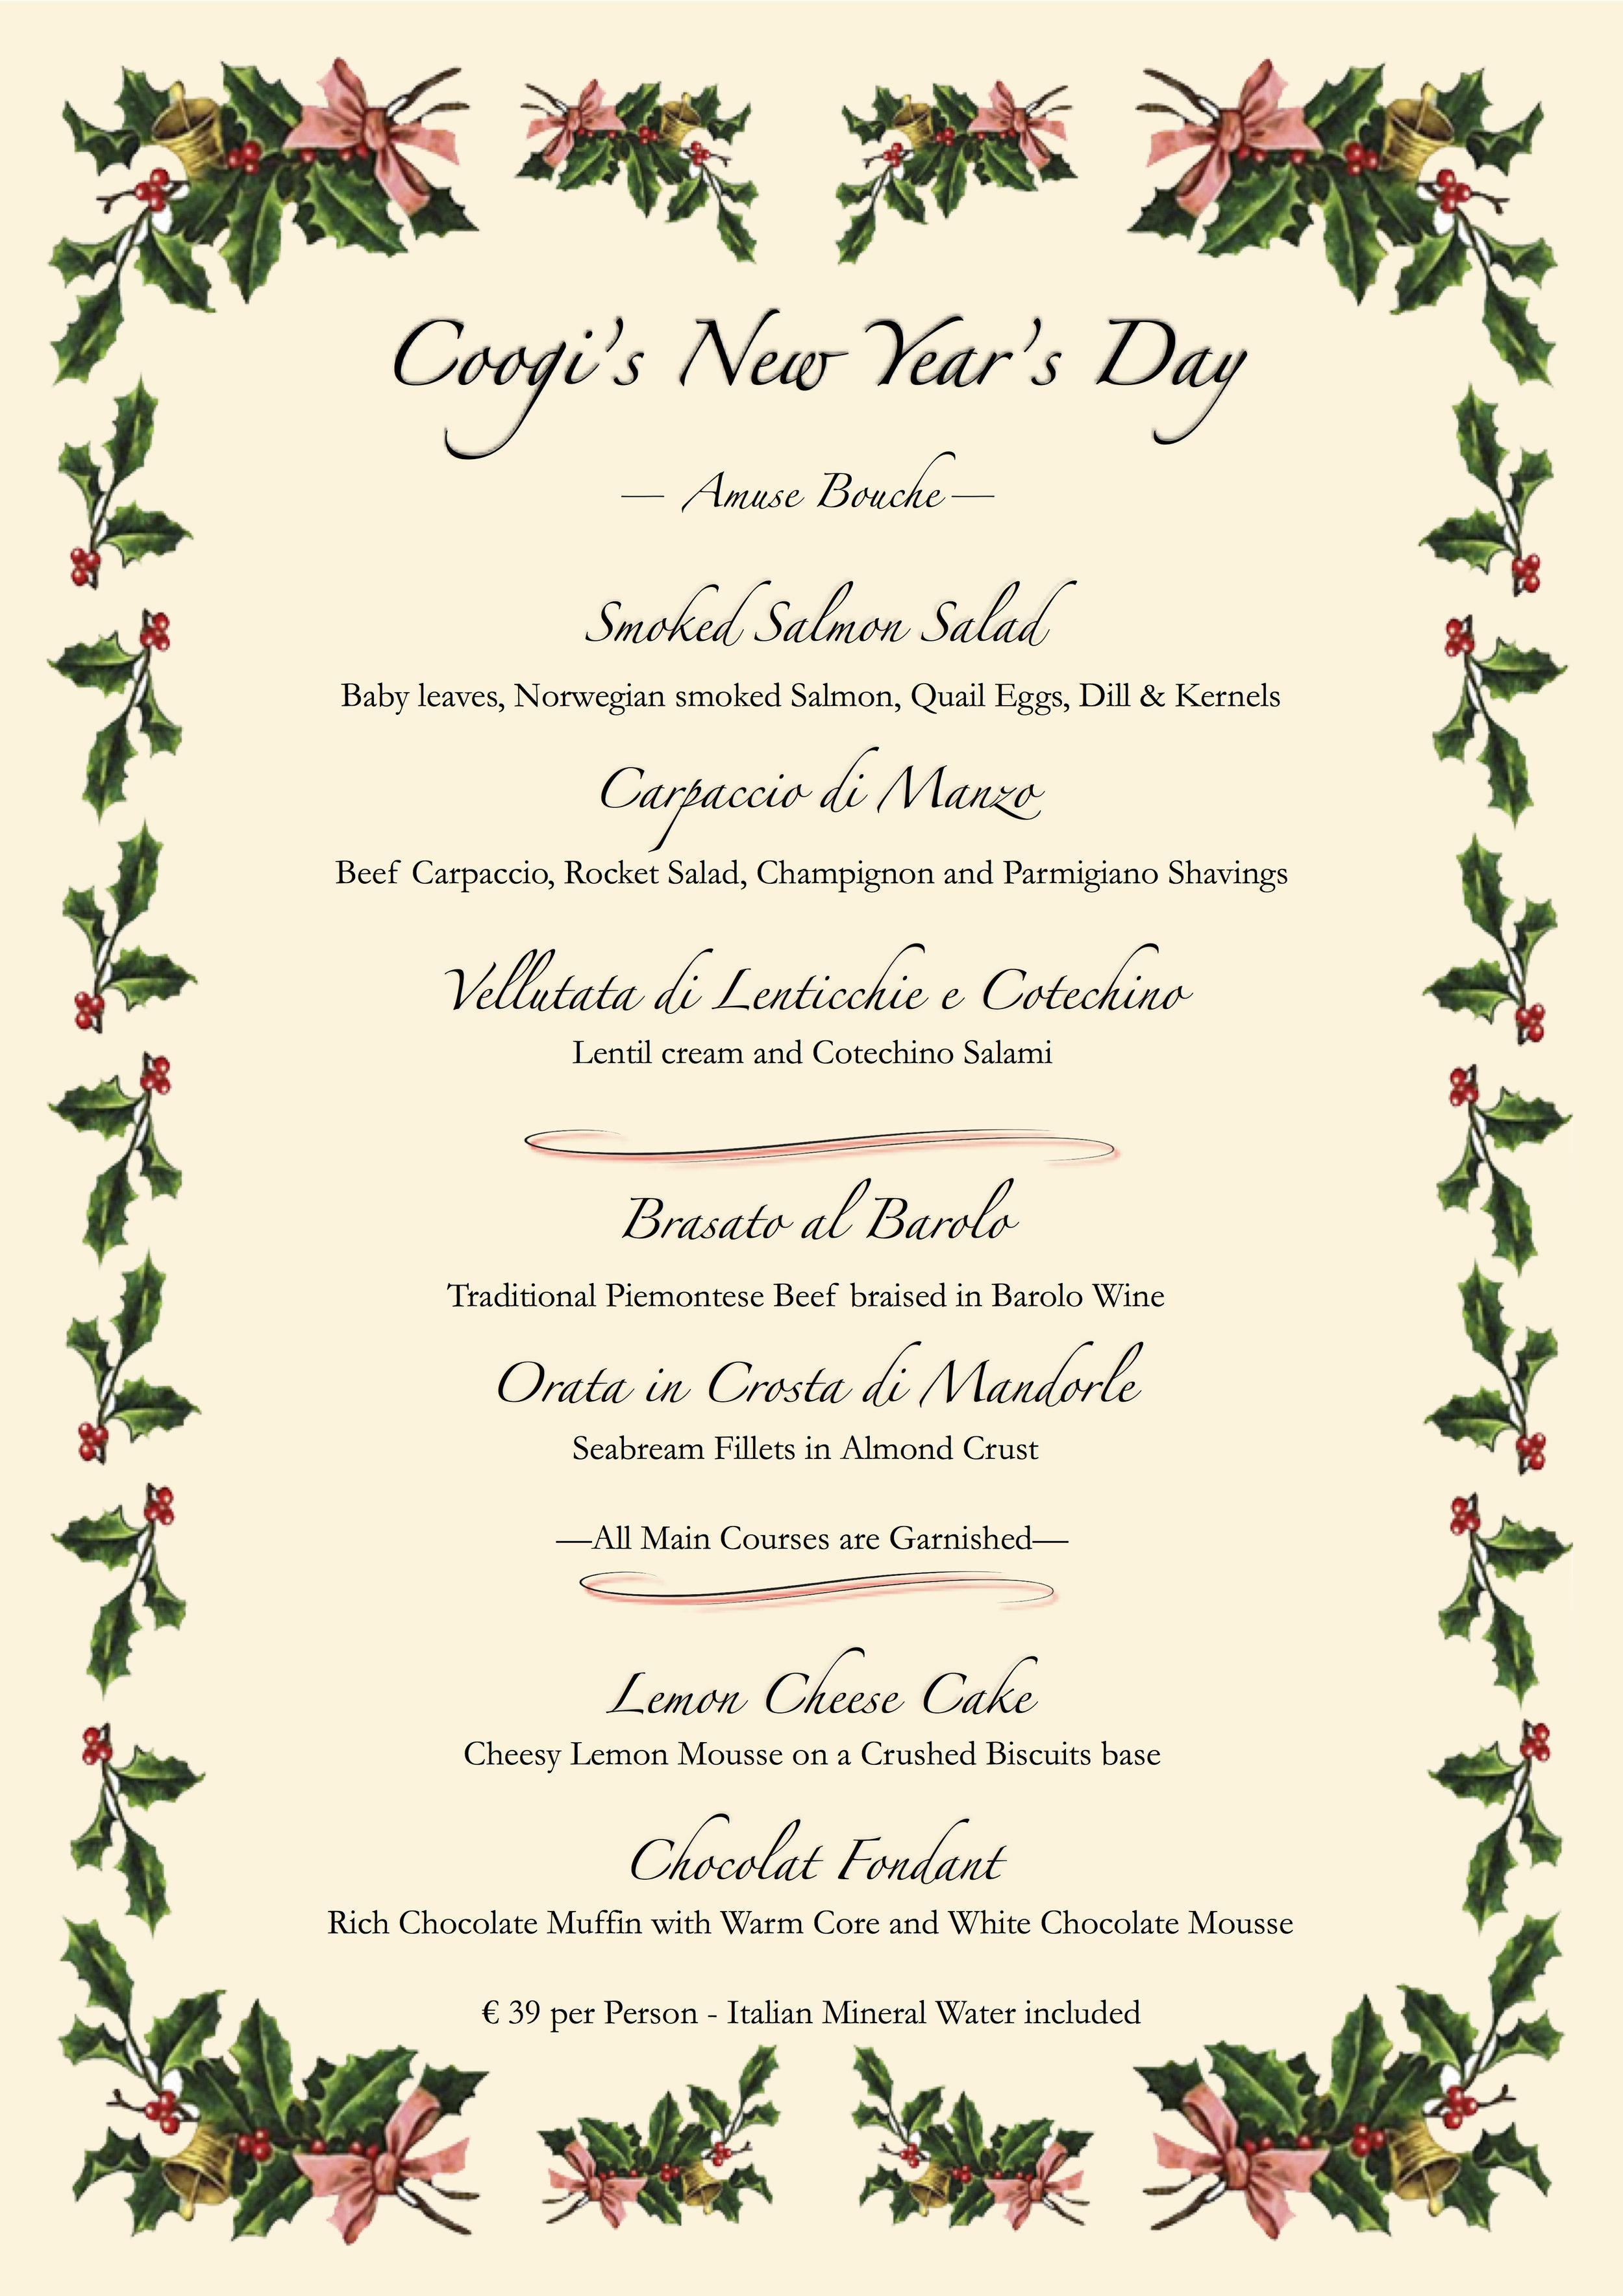 Coogi's New Year's Day 2016.jpg